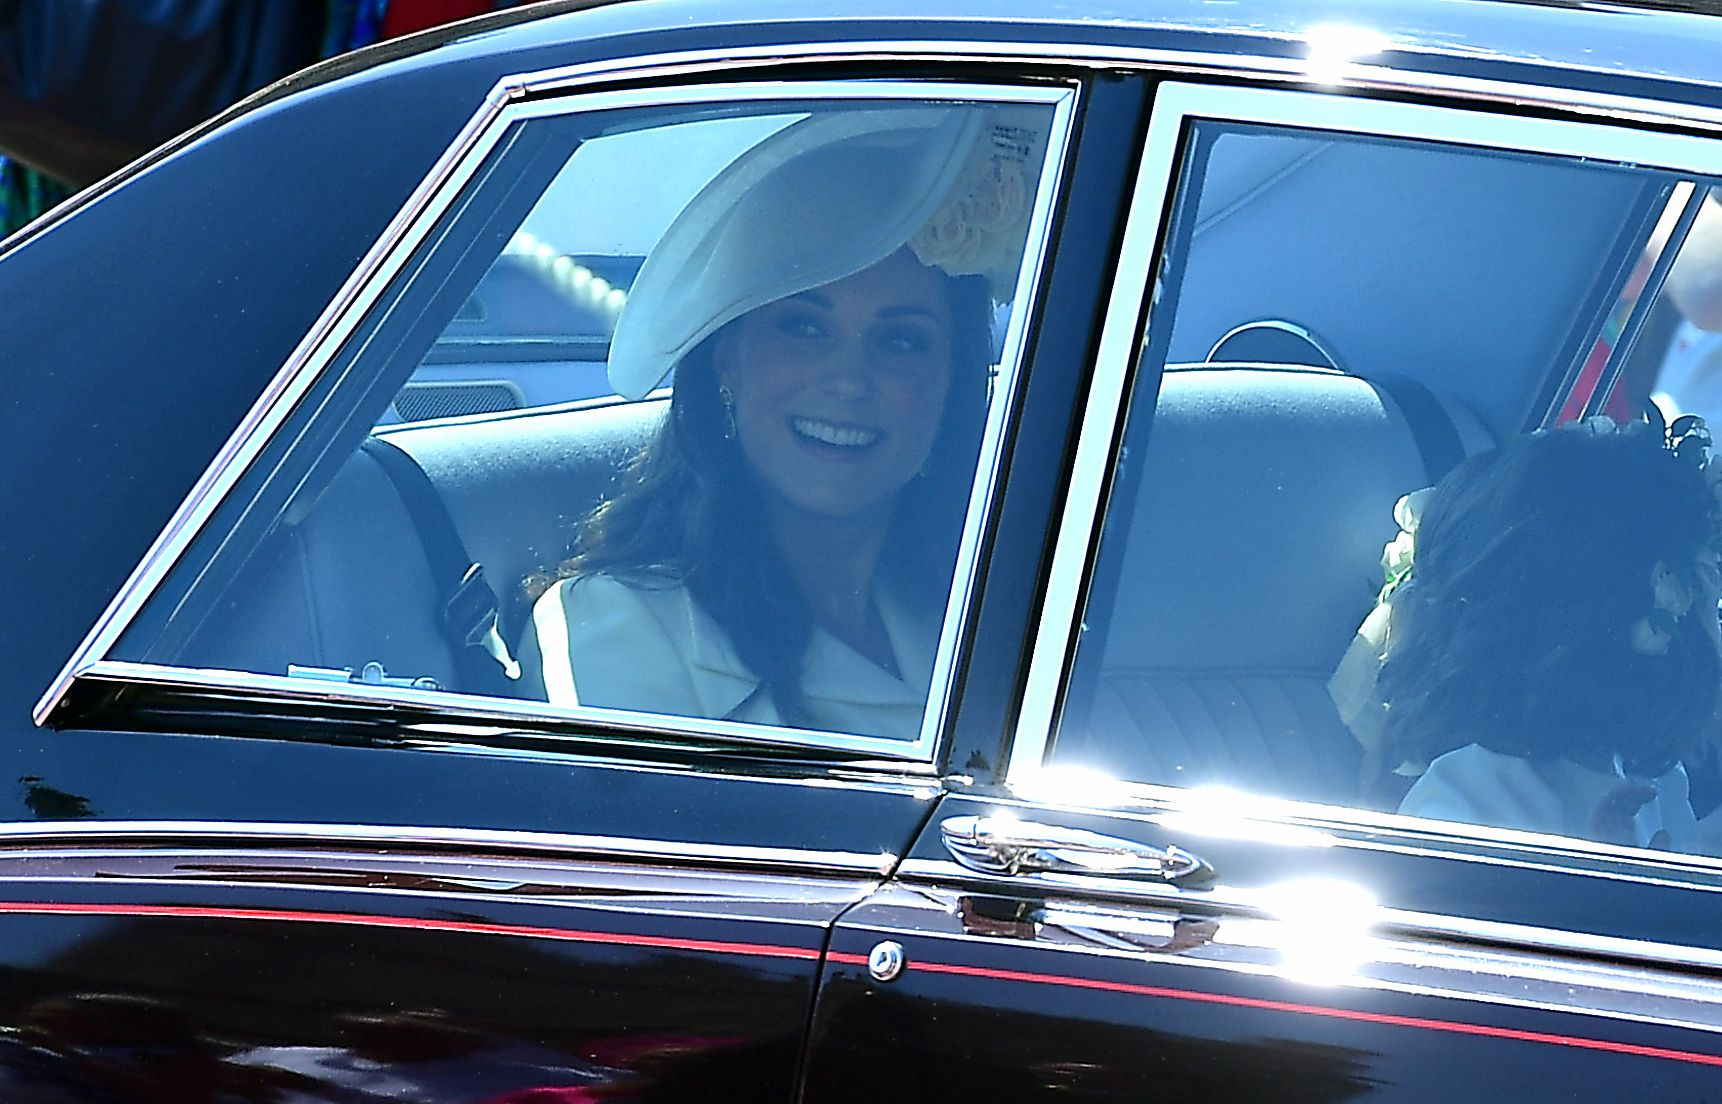 Kate Middleton\'s Dress at the Royal Wedding 2018 Revealed - Kate ...